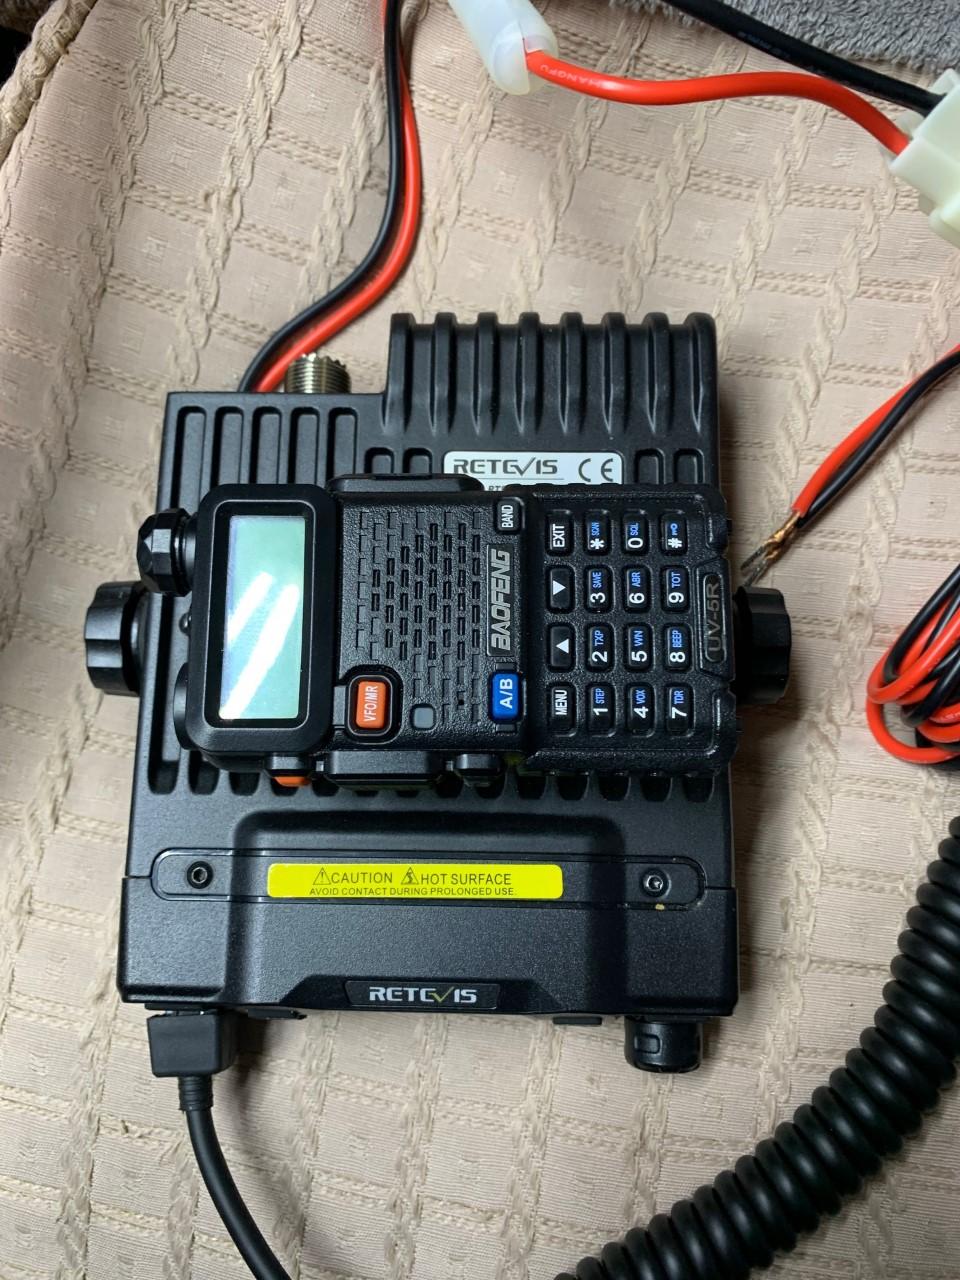 radio - Looking for micro dual band radio. 1_rv9510